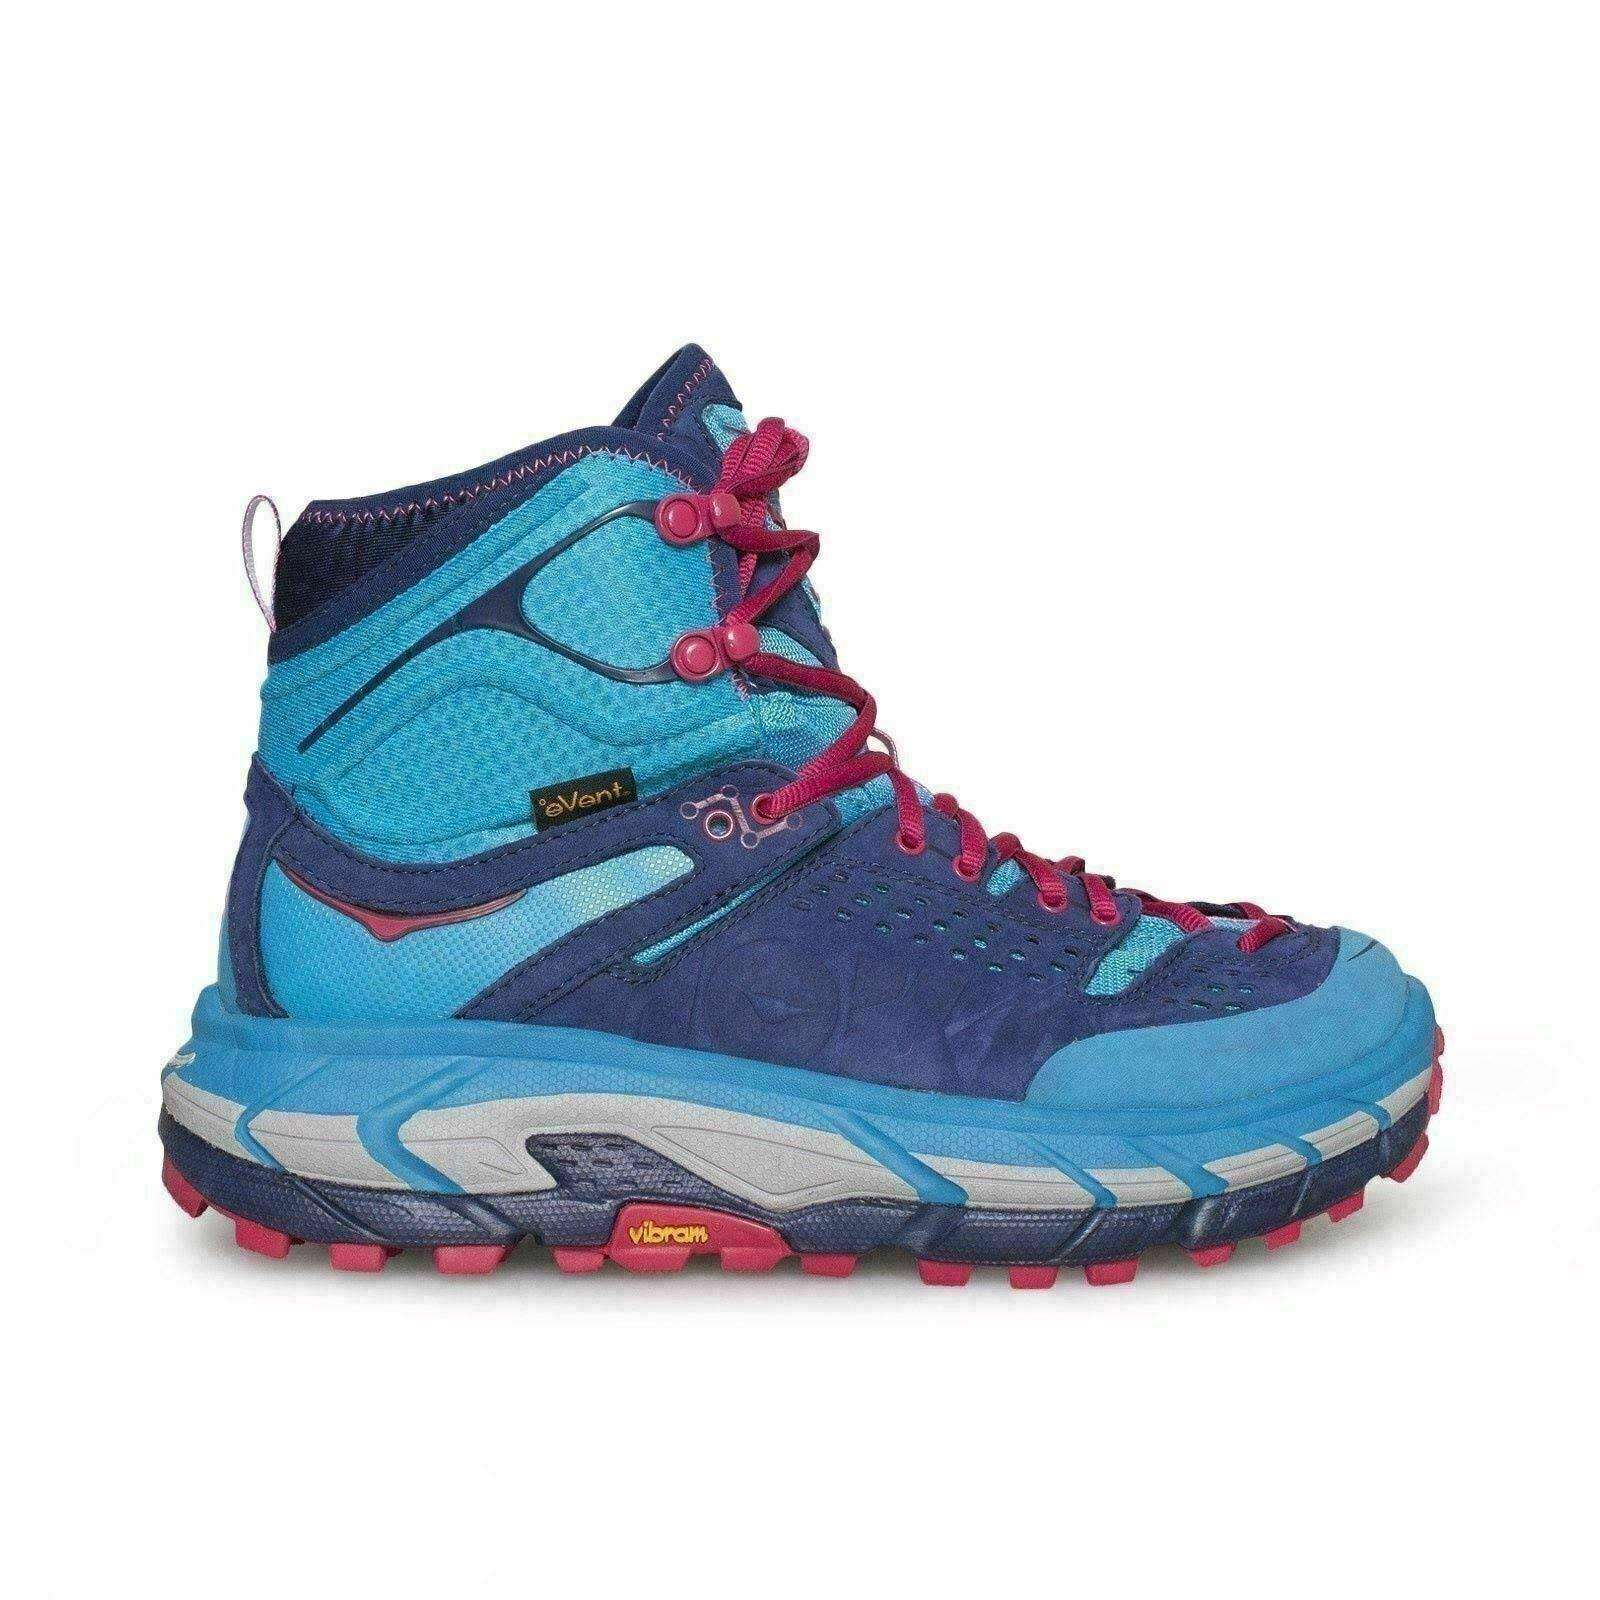 Hoka One One Tor cumbre Ultra Hi Joya Azul Azul Medieval botas de EE. UU. nuevo